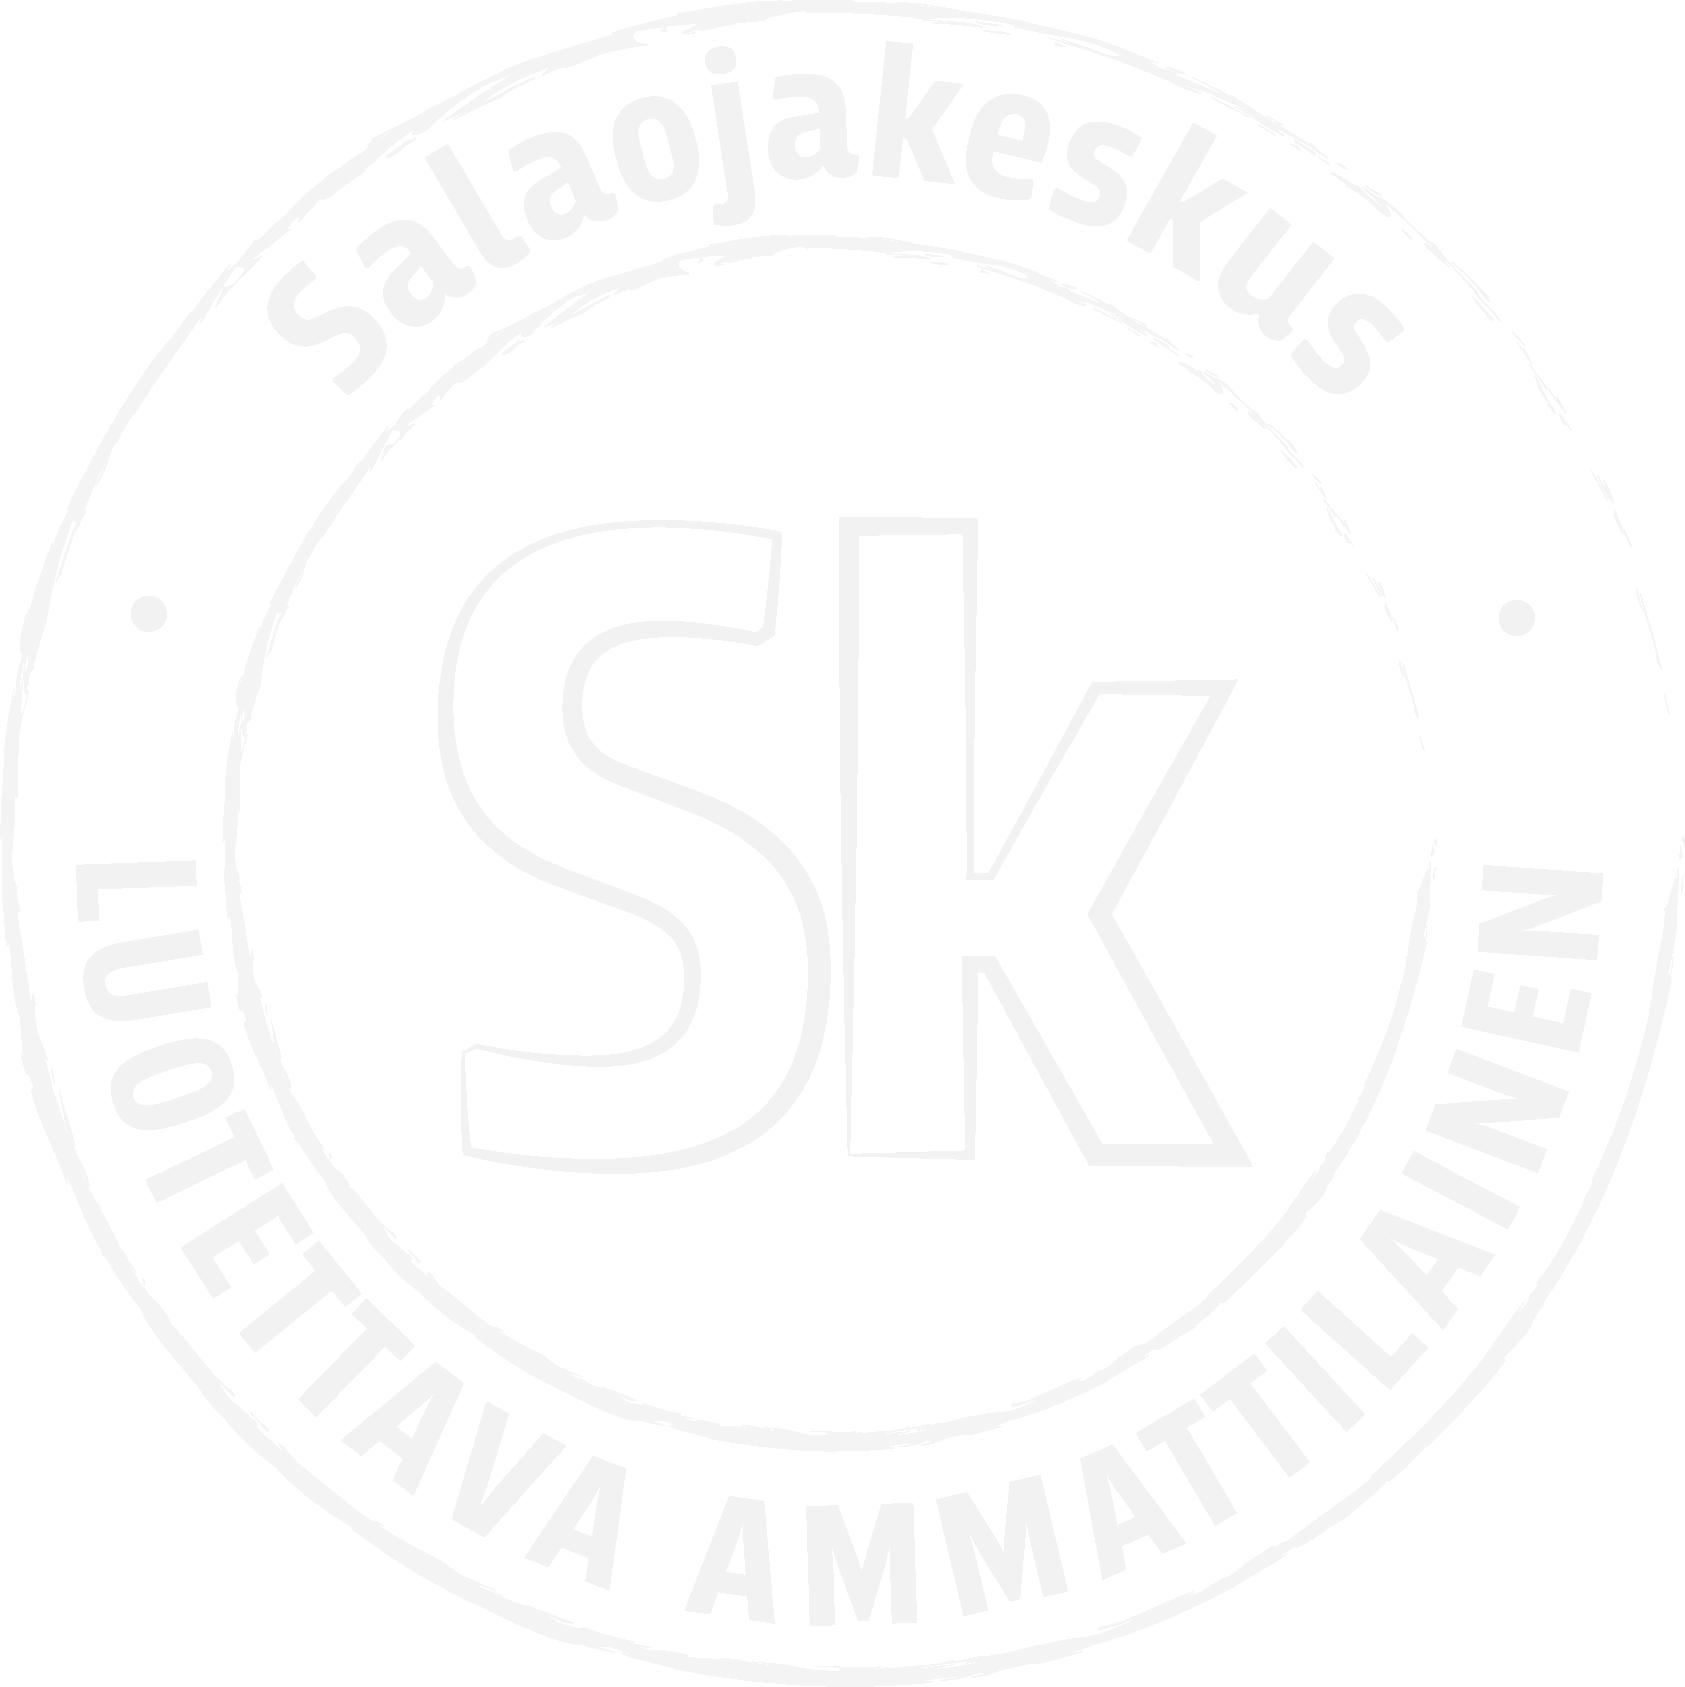 salaojat salaojakeskus logo